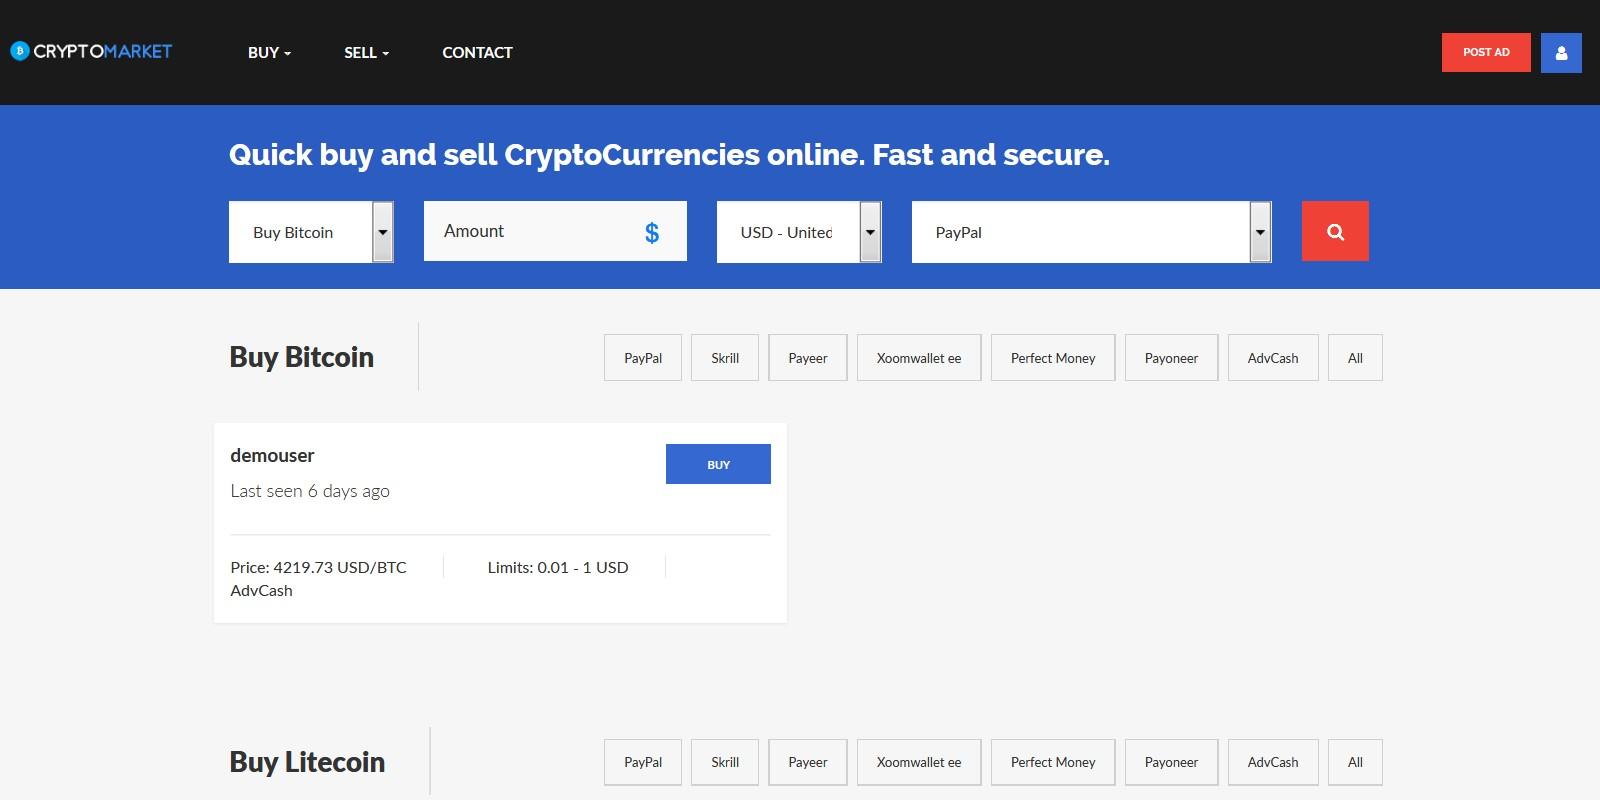 CryptoMarket - Crypto P2P Trading Platform